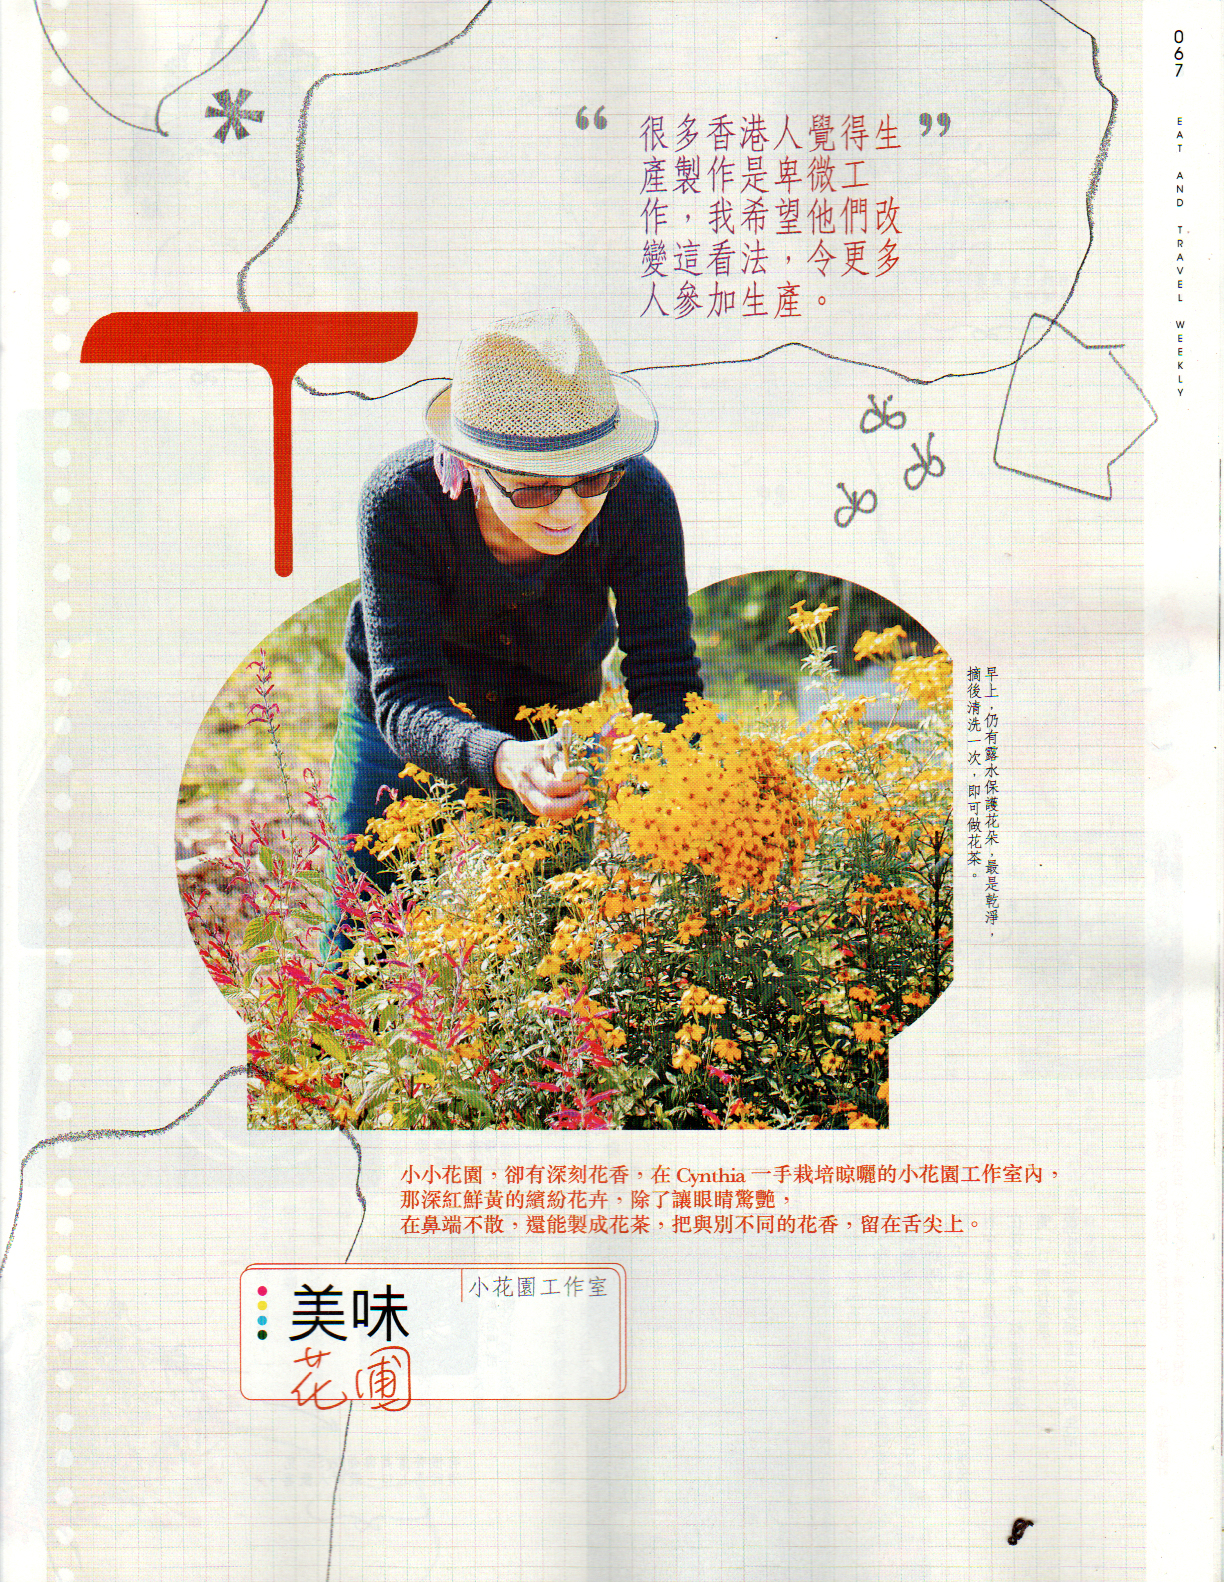 Jan 2015 Eat & Travel Weekly 飲食男女 P1